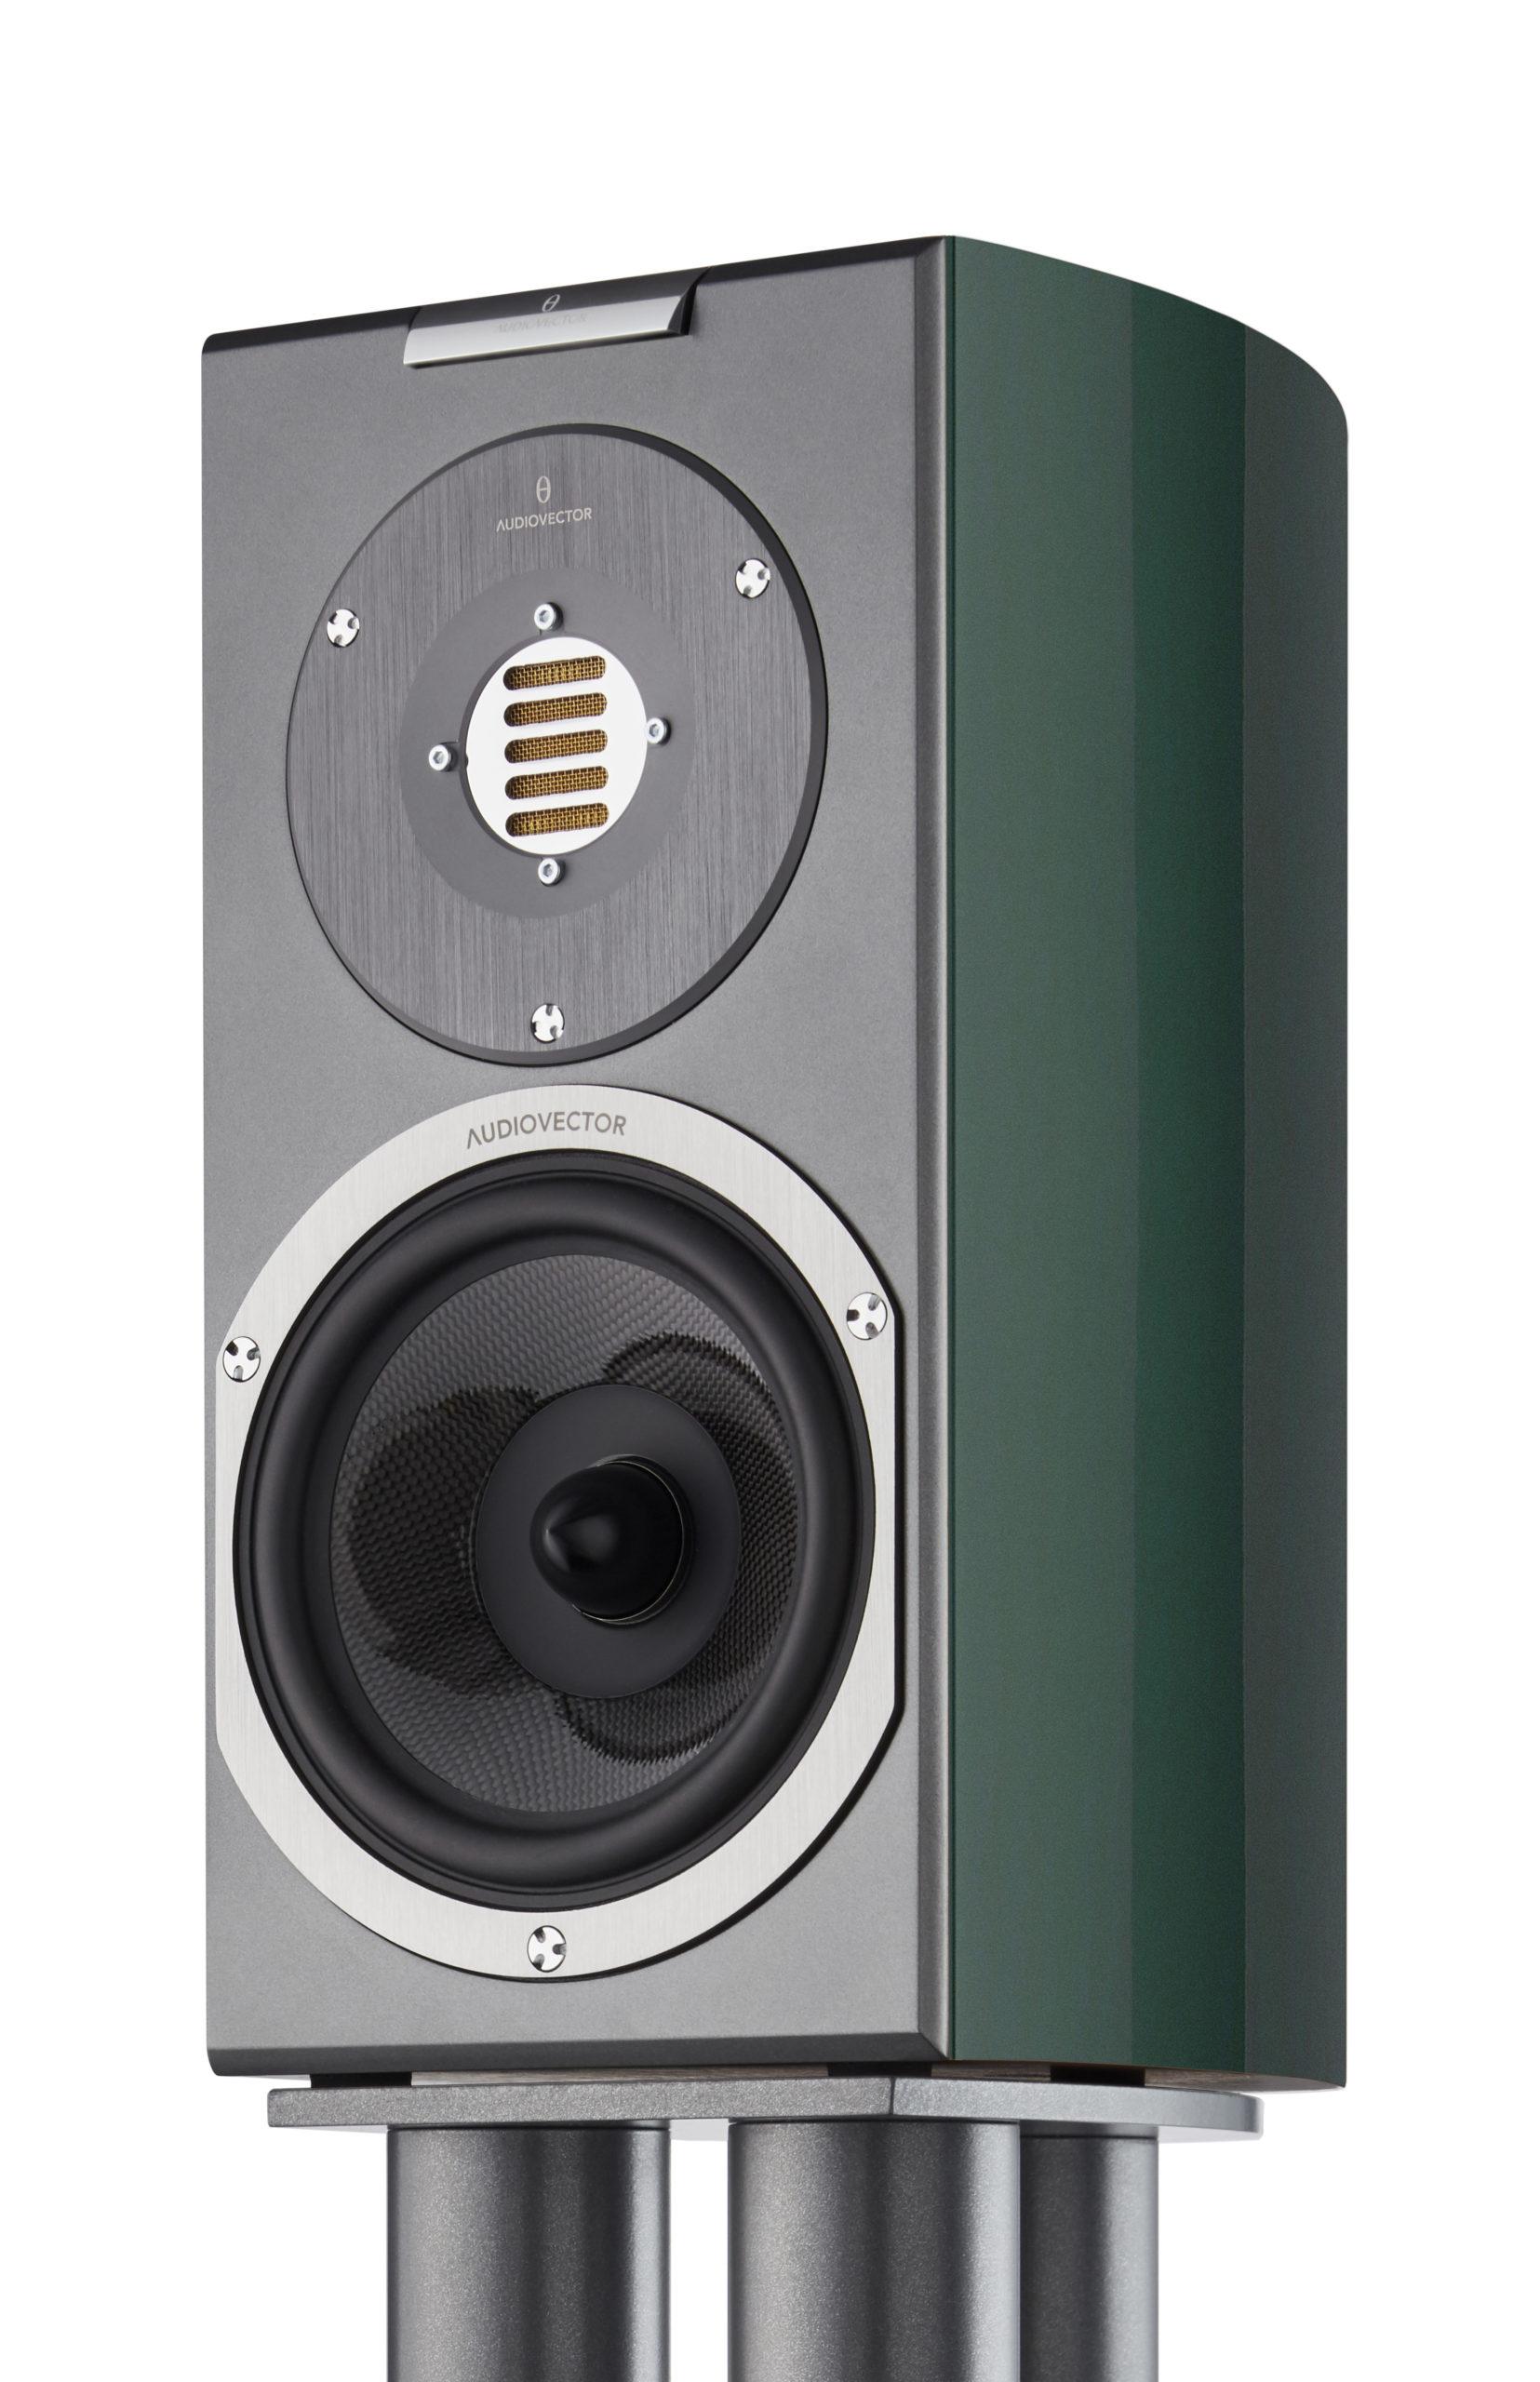 Audiovector R1 Arreté Loudspeaker